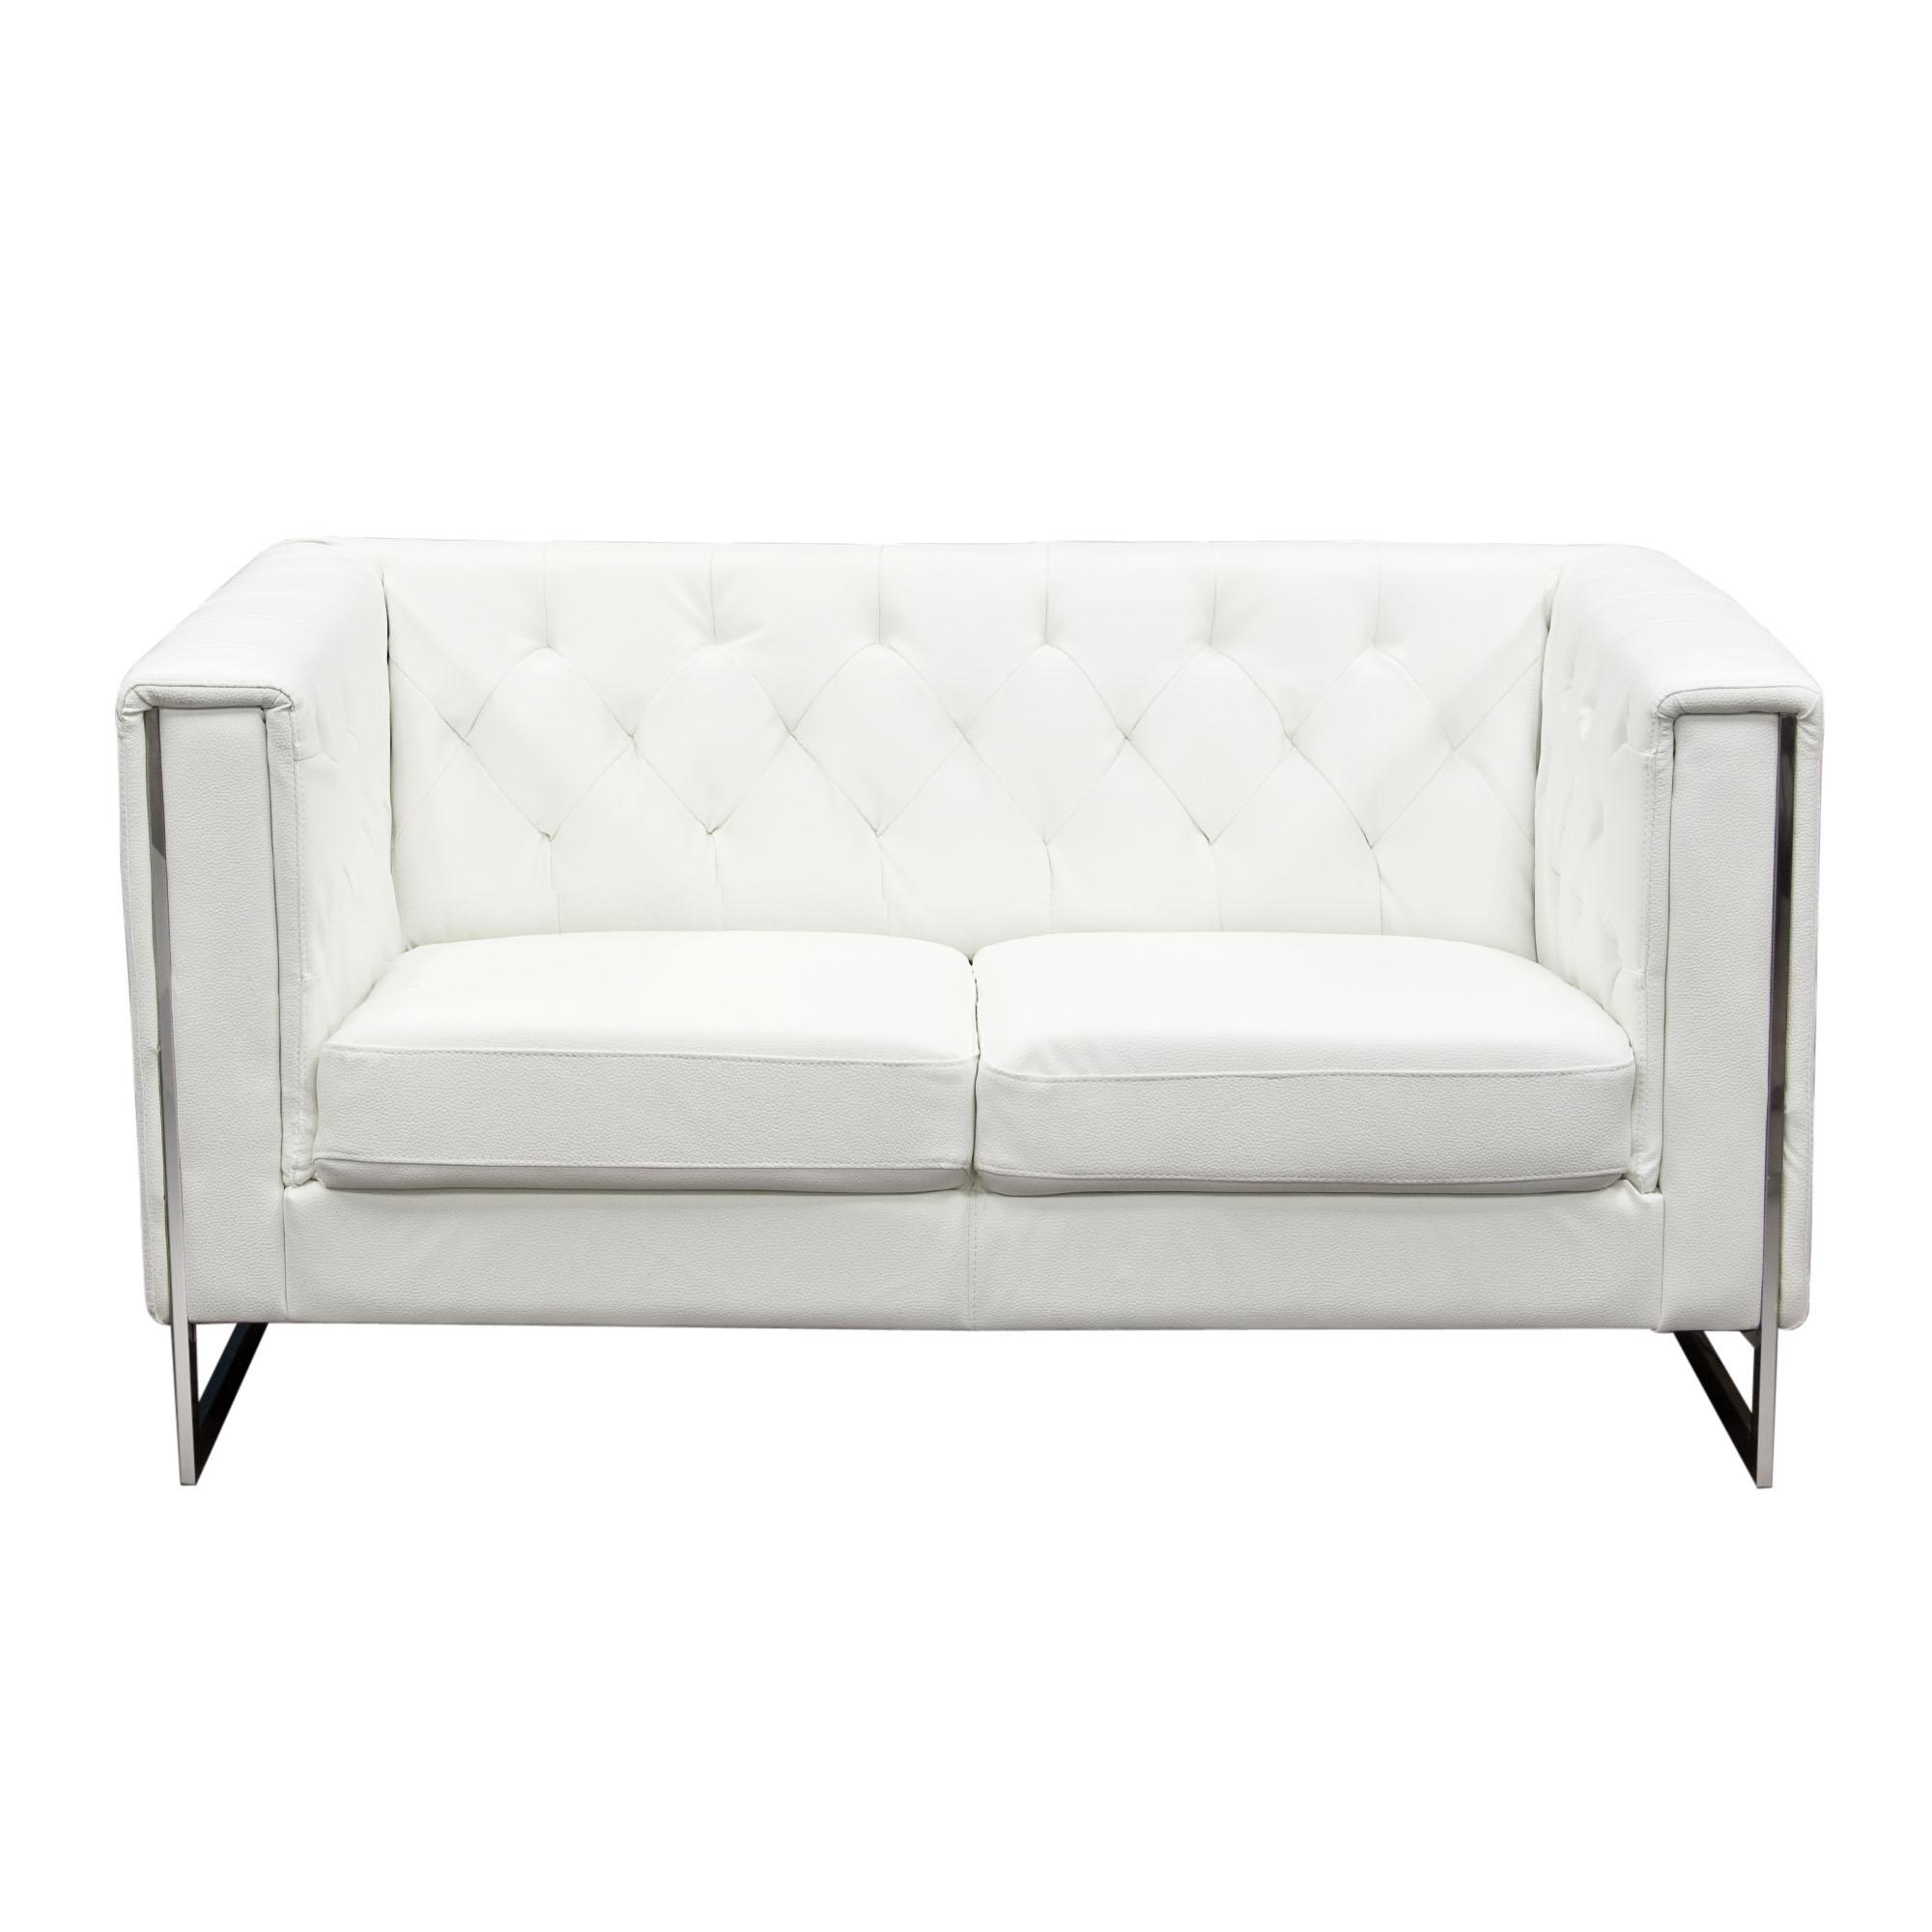 Diamond Sofa Chelsea Loveseat - Item Number: CHELSEALOWH